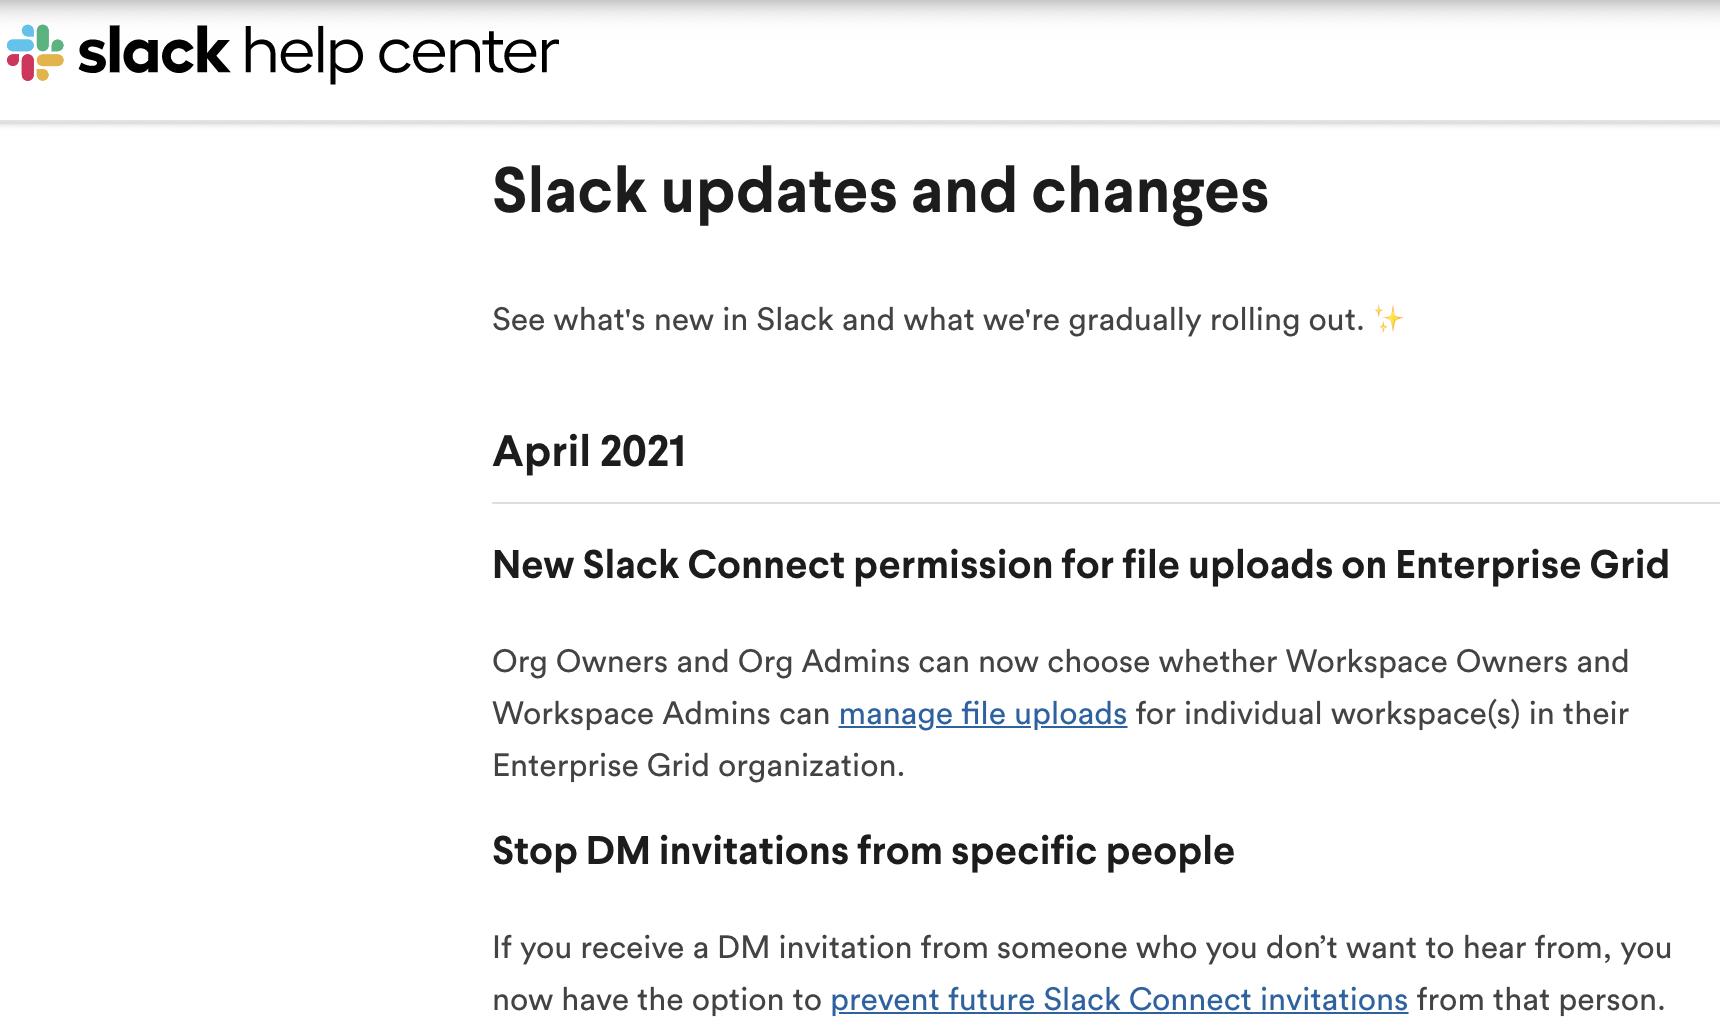 Slack updates and changes